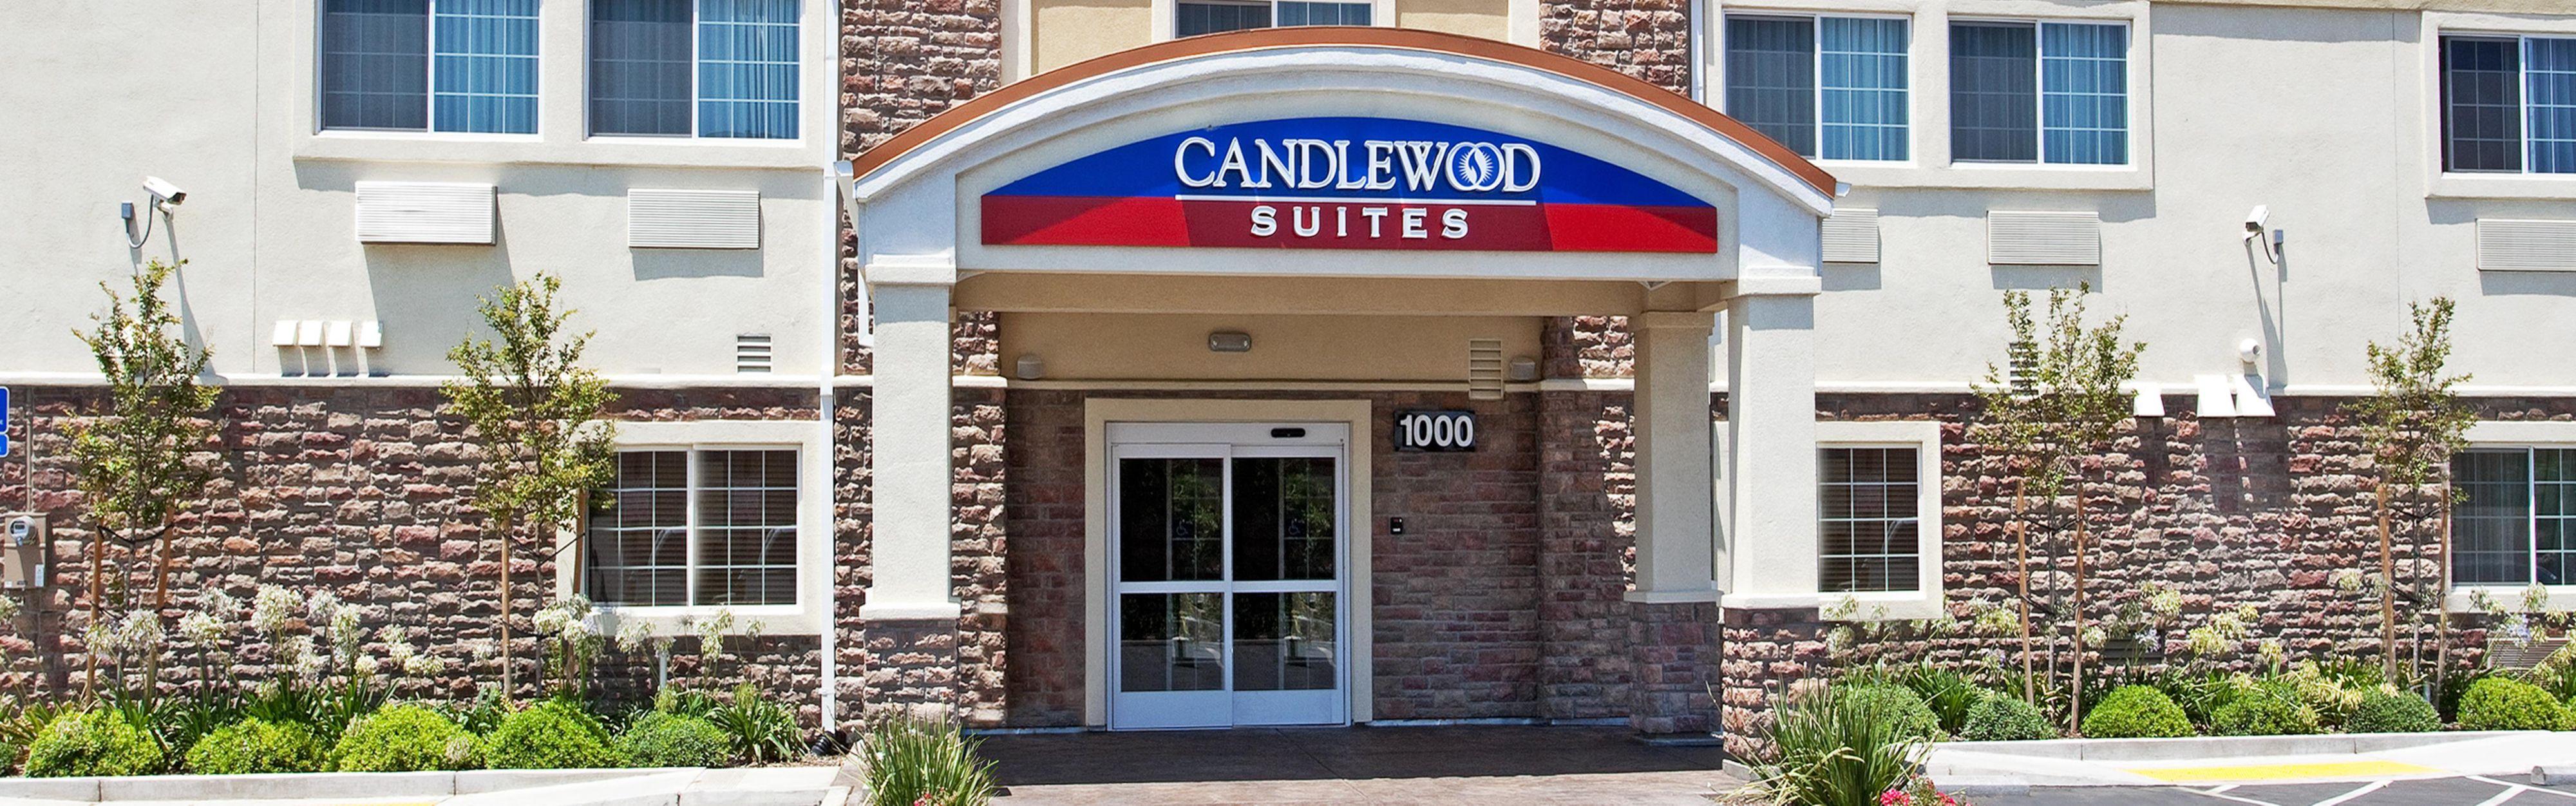 Candlewood Suites Turlock image 0